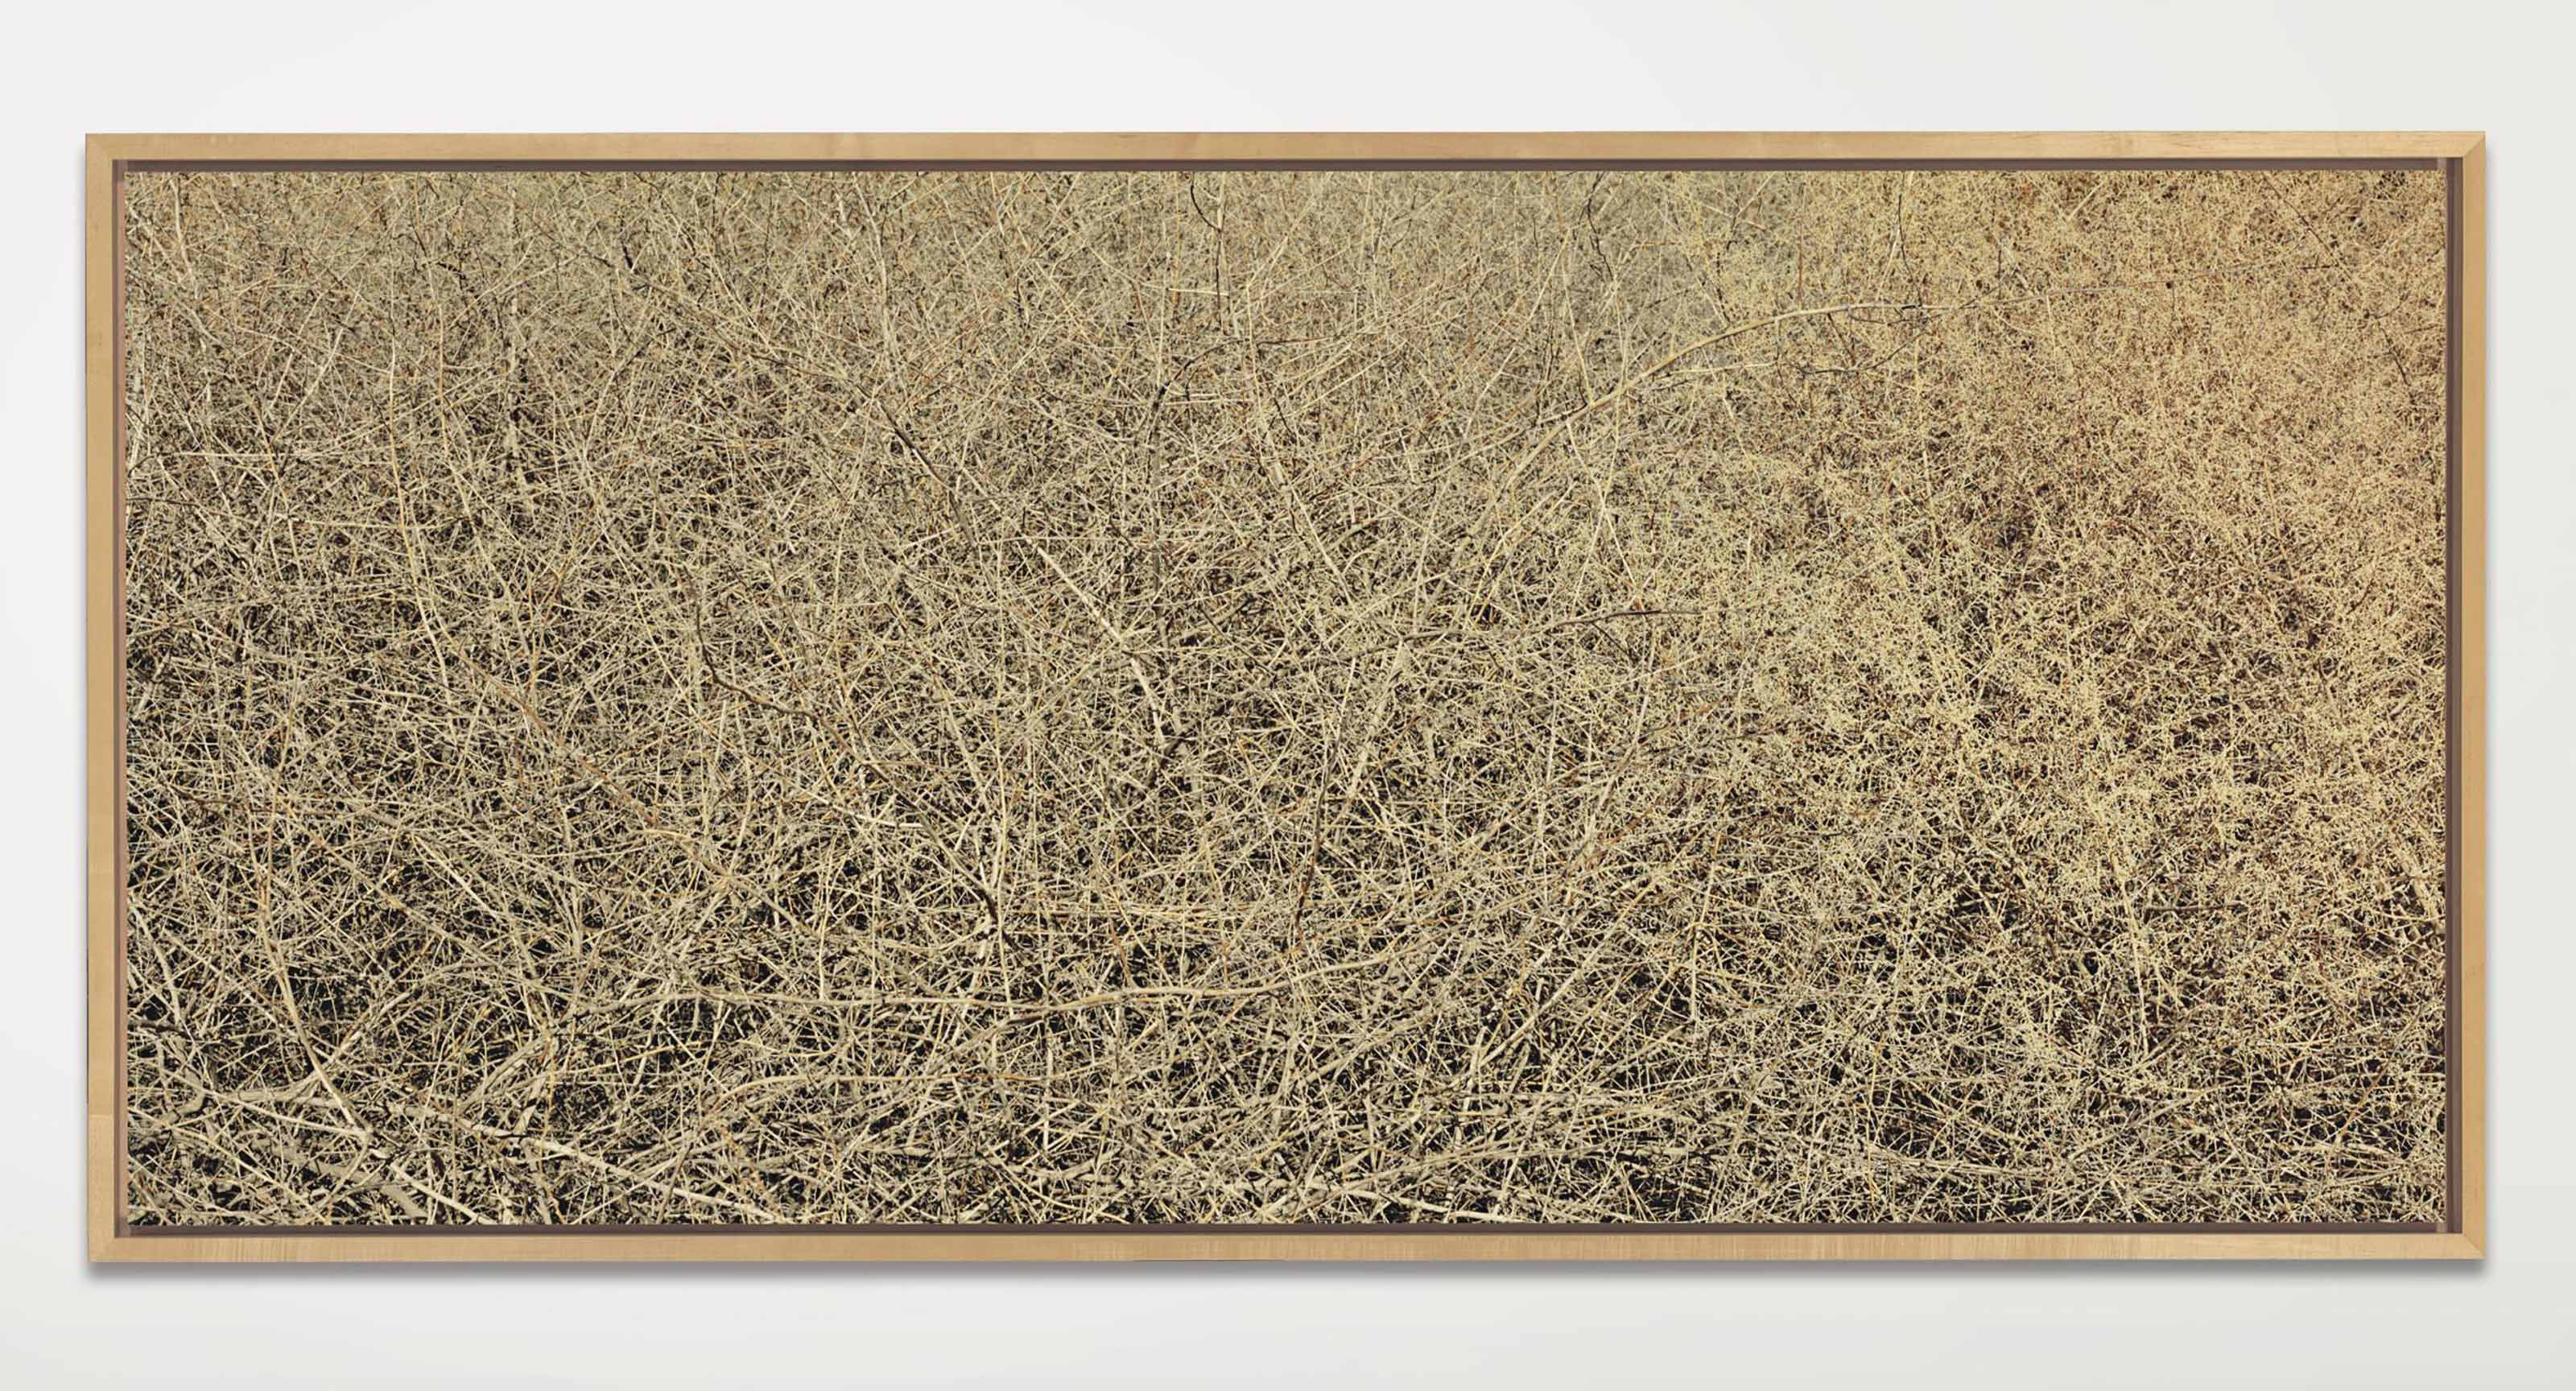 Untitled #724-96, 1996